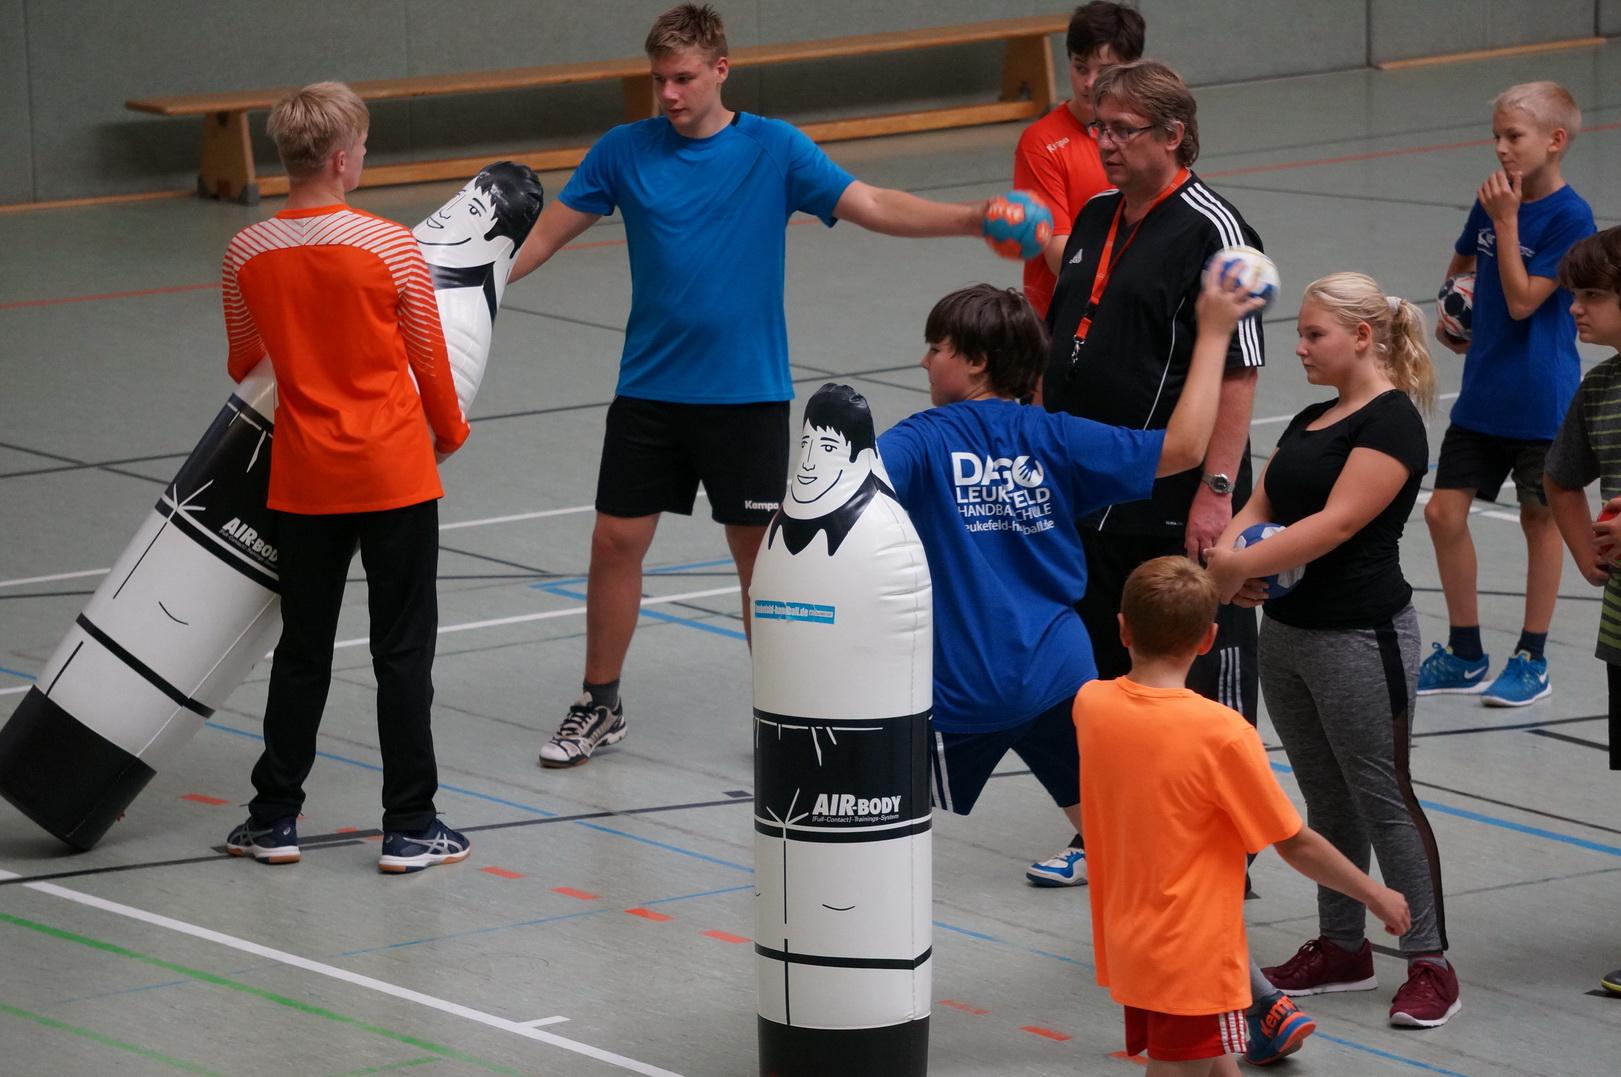 201808_Handballcamp_SDH_MG_241w